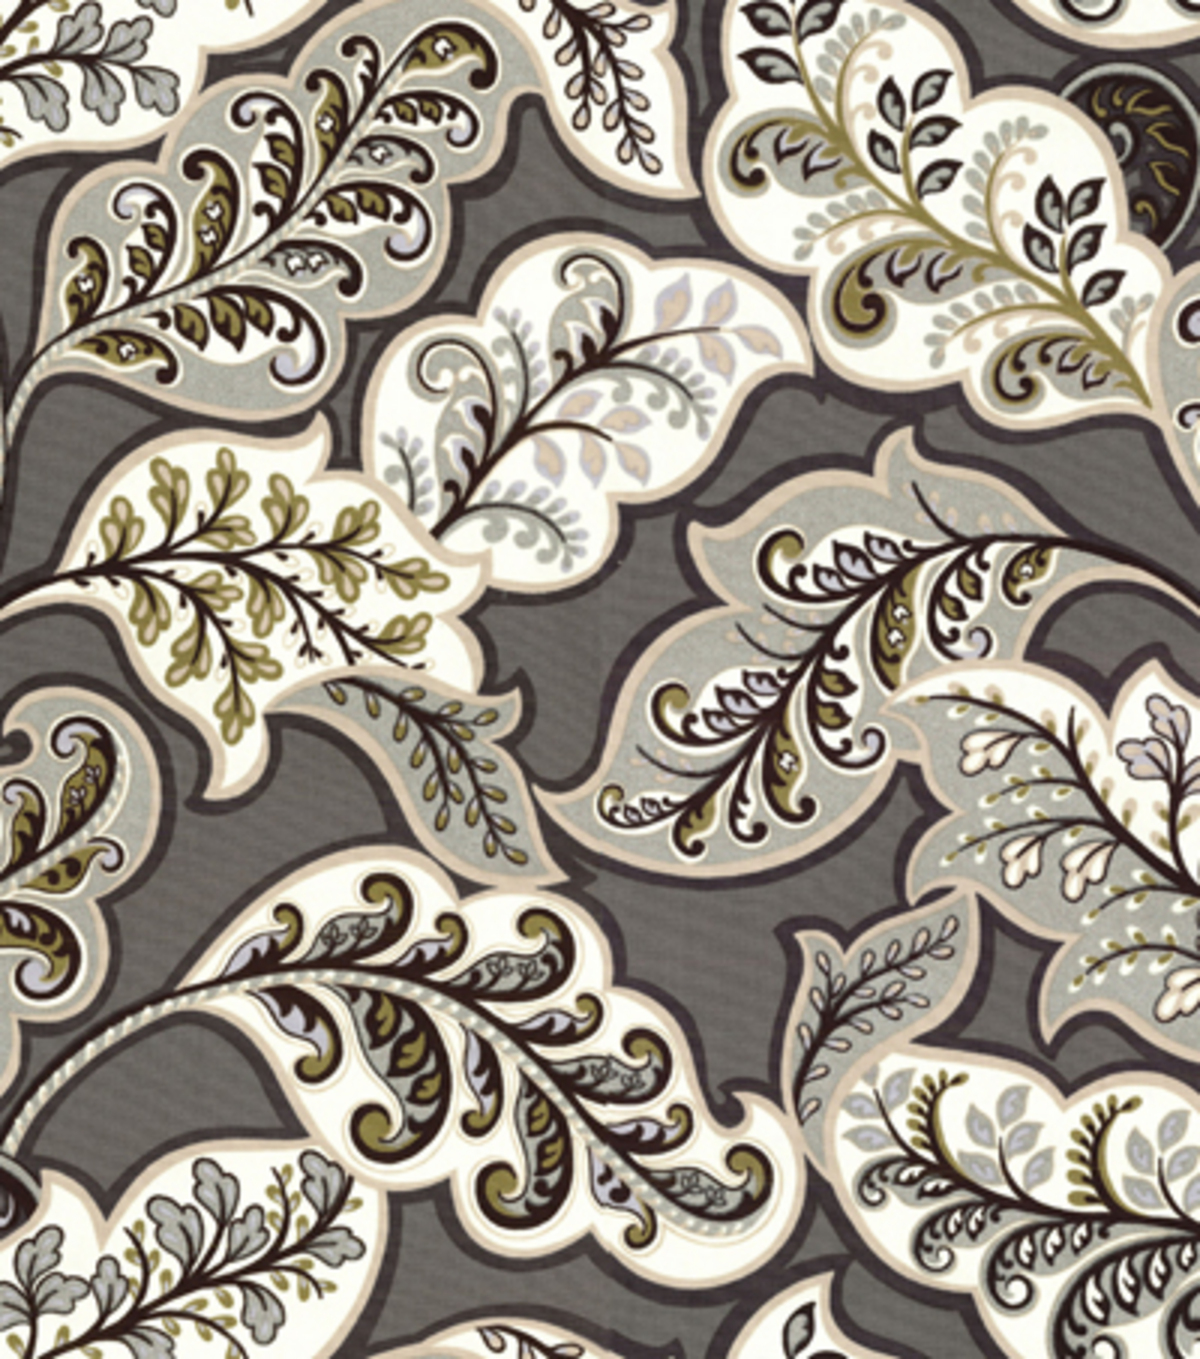 Super Upholstery Fabric- HGTV HOME Deco Drama Zinc | JOANN HW-63